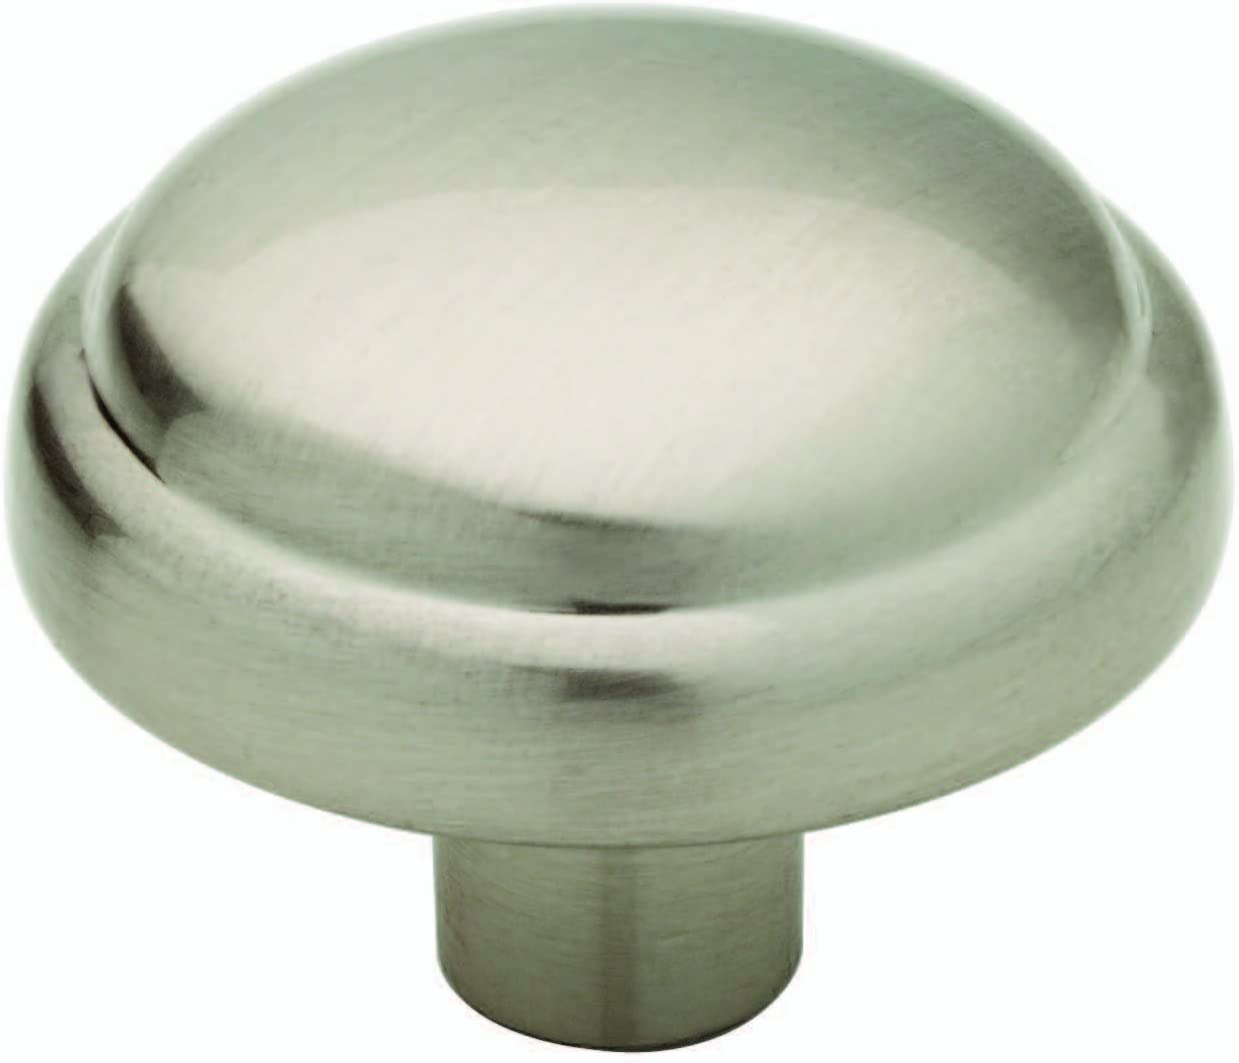 Franklin Brass P34702-SN-B Bin Cup Pull 25 Piece 3 76mm Brushed Nickel